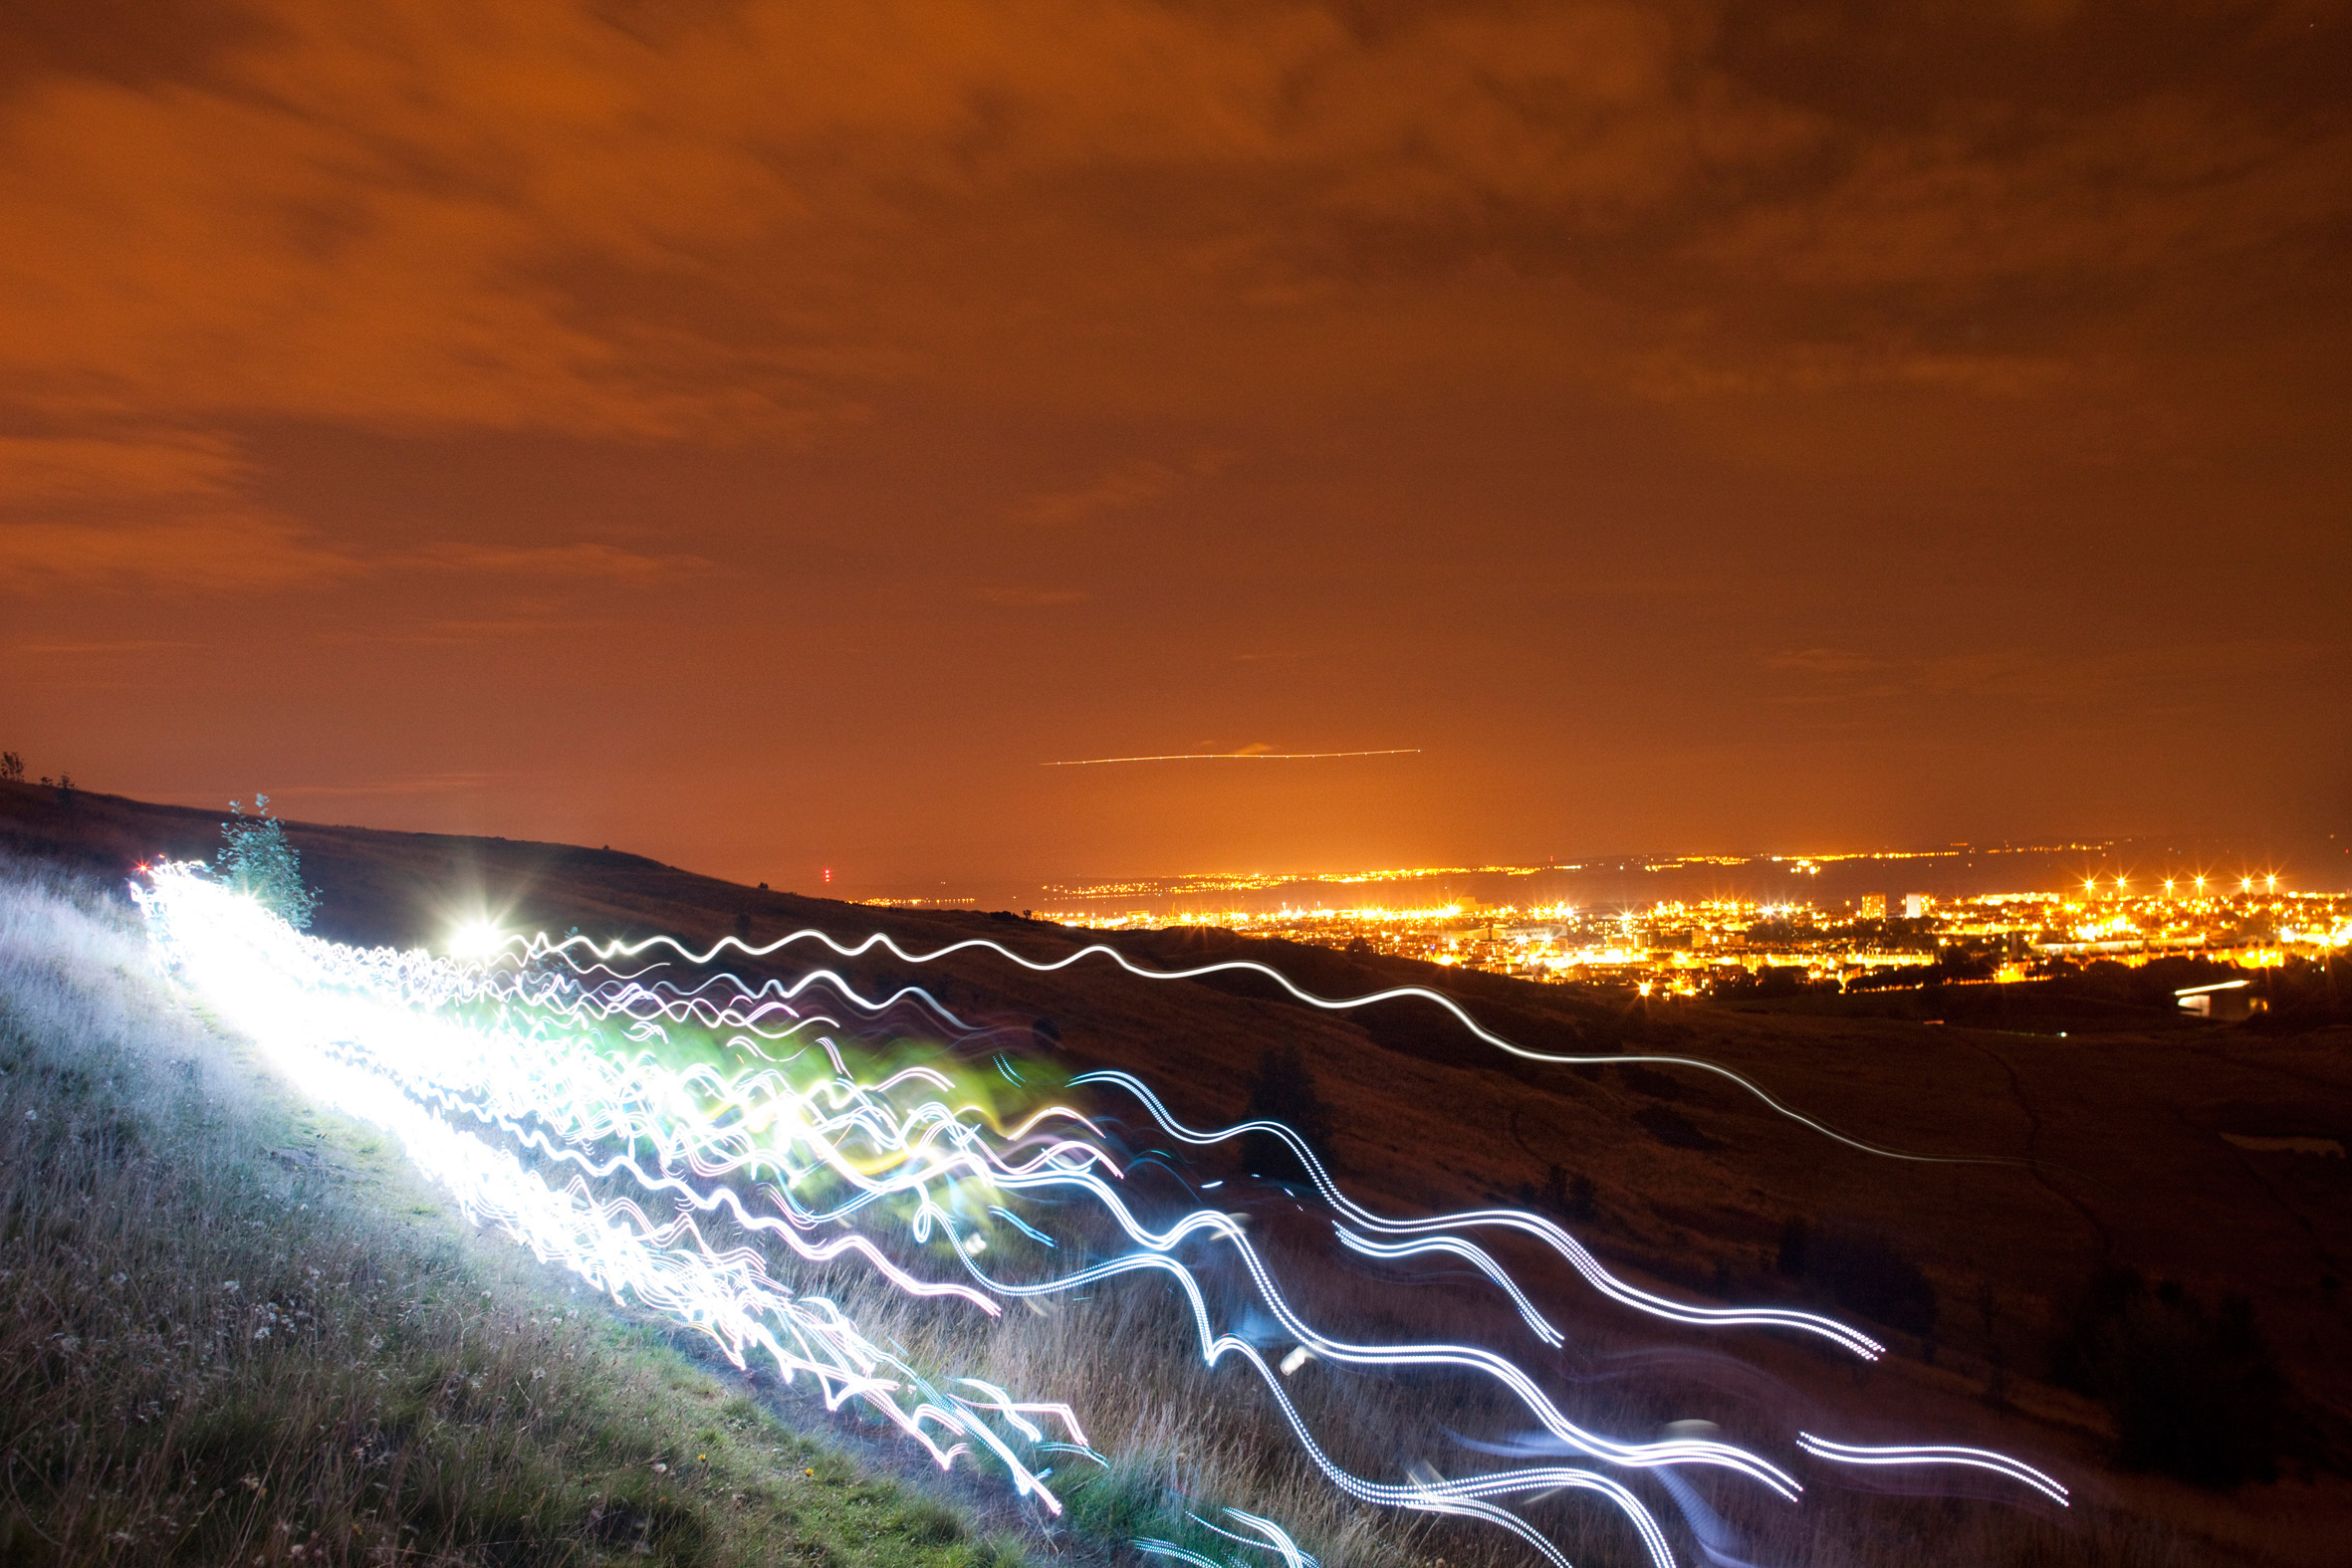 Speed of Light Edinburgh London England Scotland Deutschland Ruhrgebiet Ruhr Fotos Bilder Pictures Movies Runer Lightrunner Lightsuite LED Fotos Pictures Images